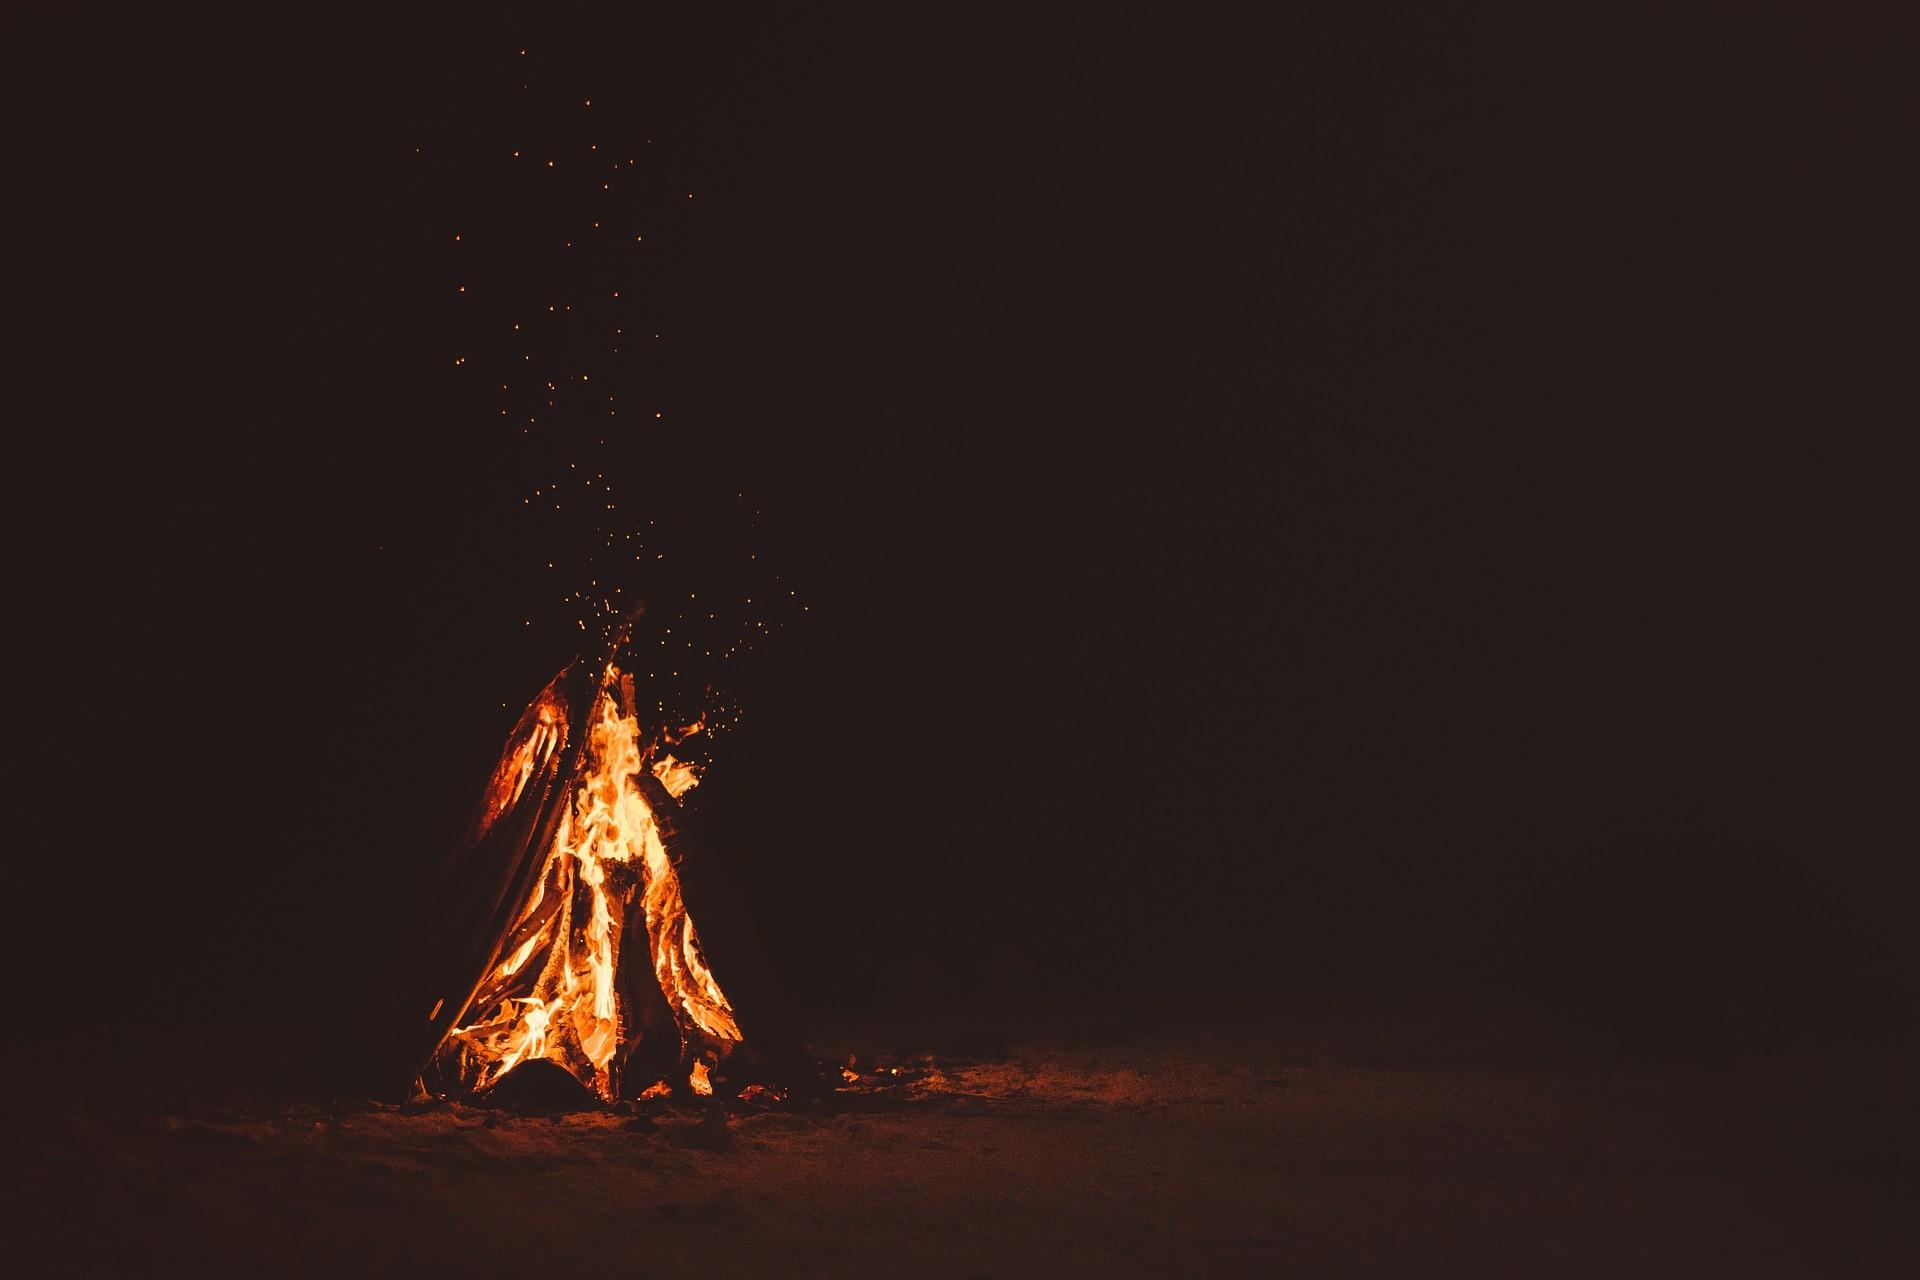 news-main-fire-tribe-mauritius-ils-ont-le-feu-sacre.1553719734.jpg